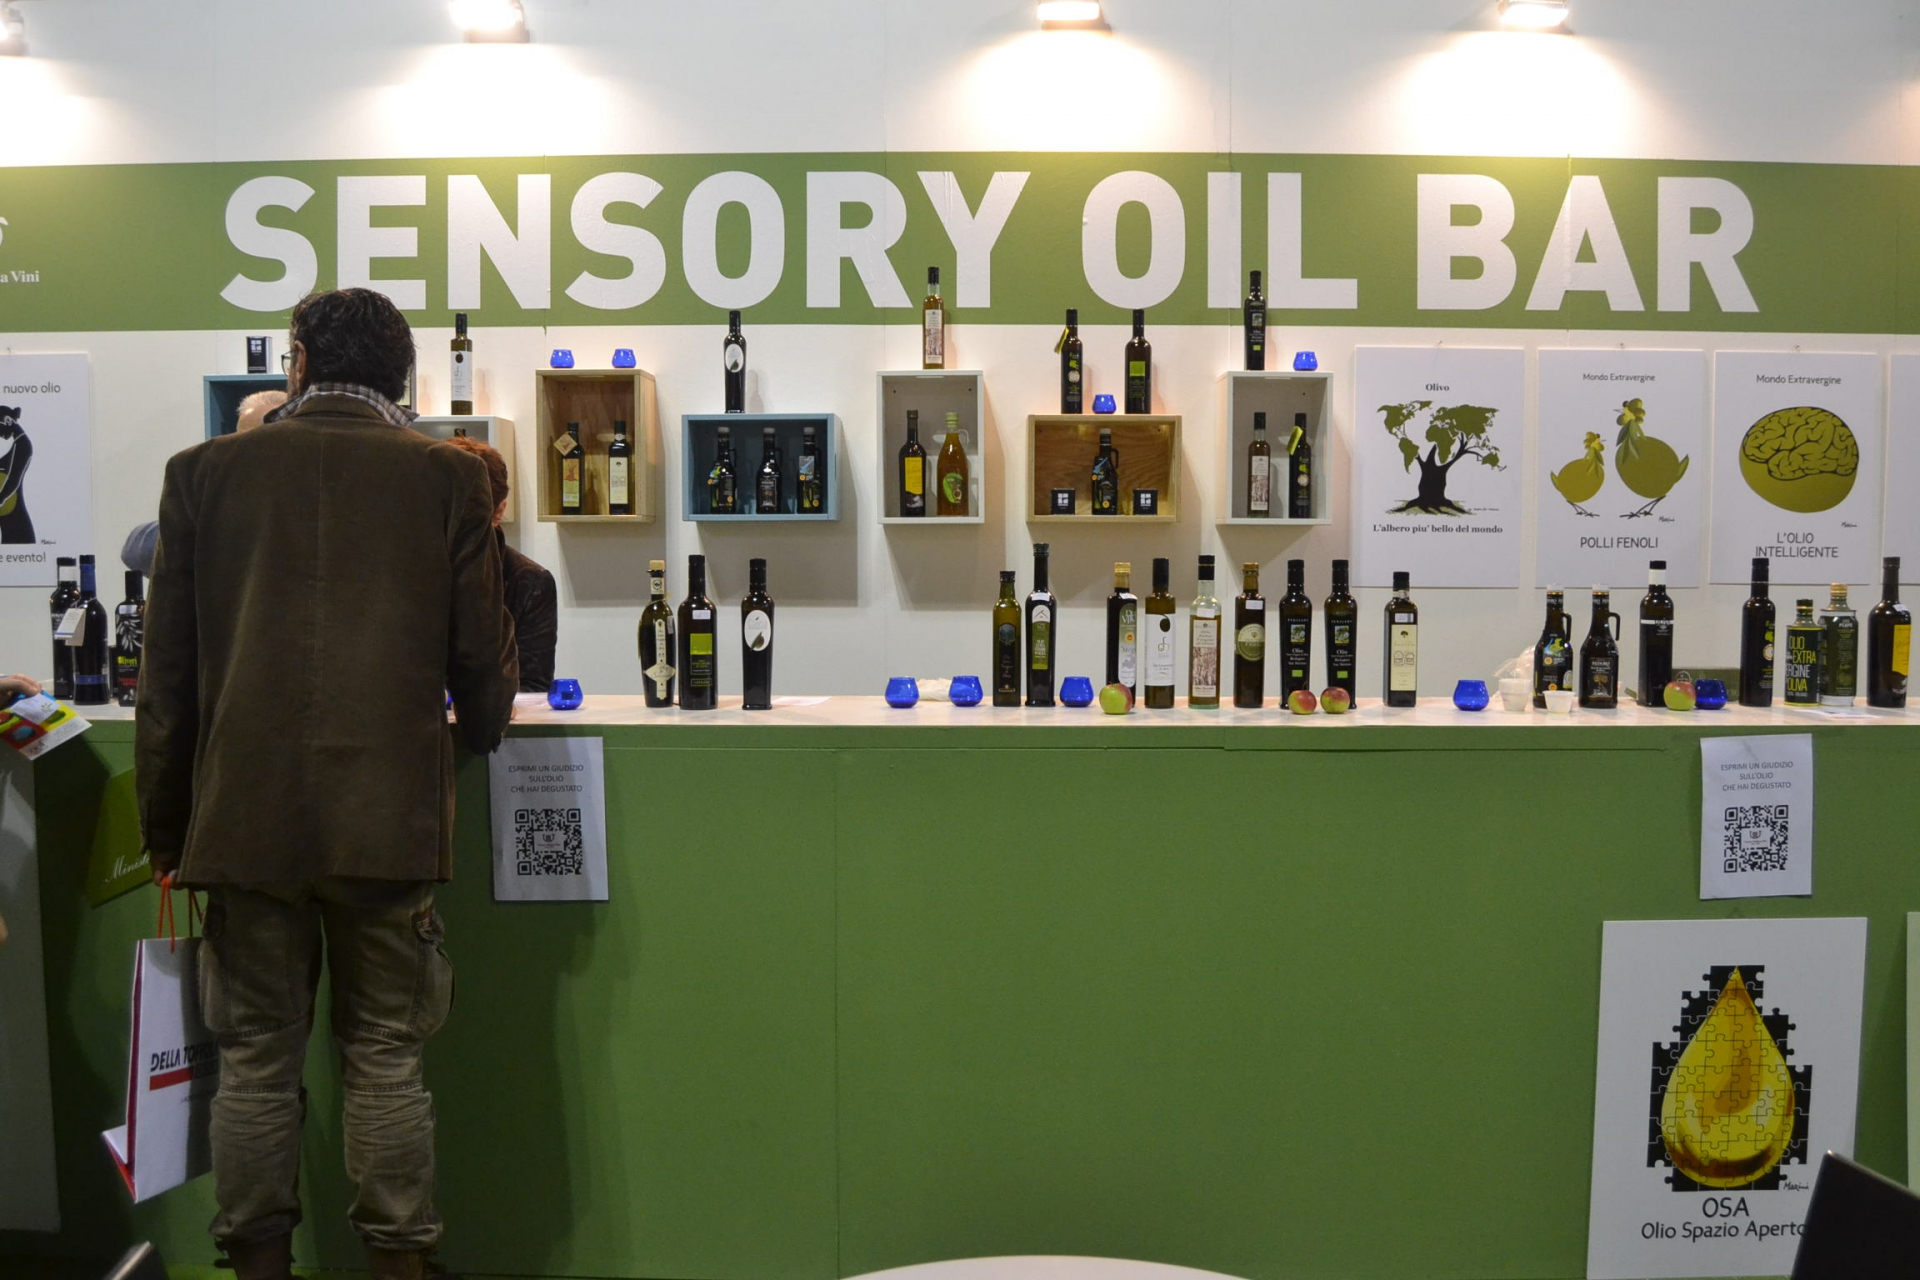 Sensory Oil Bar